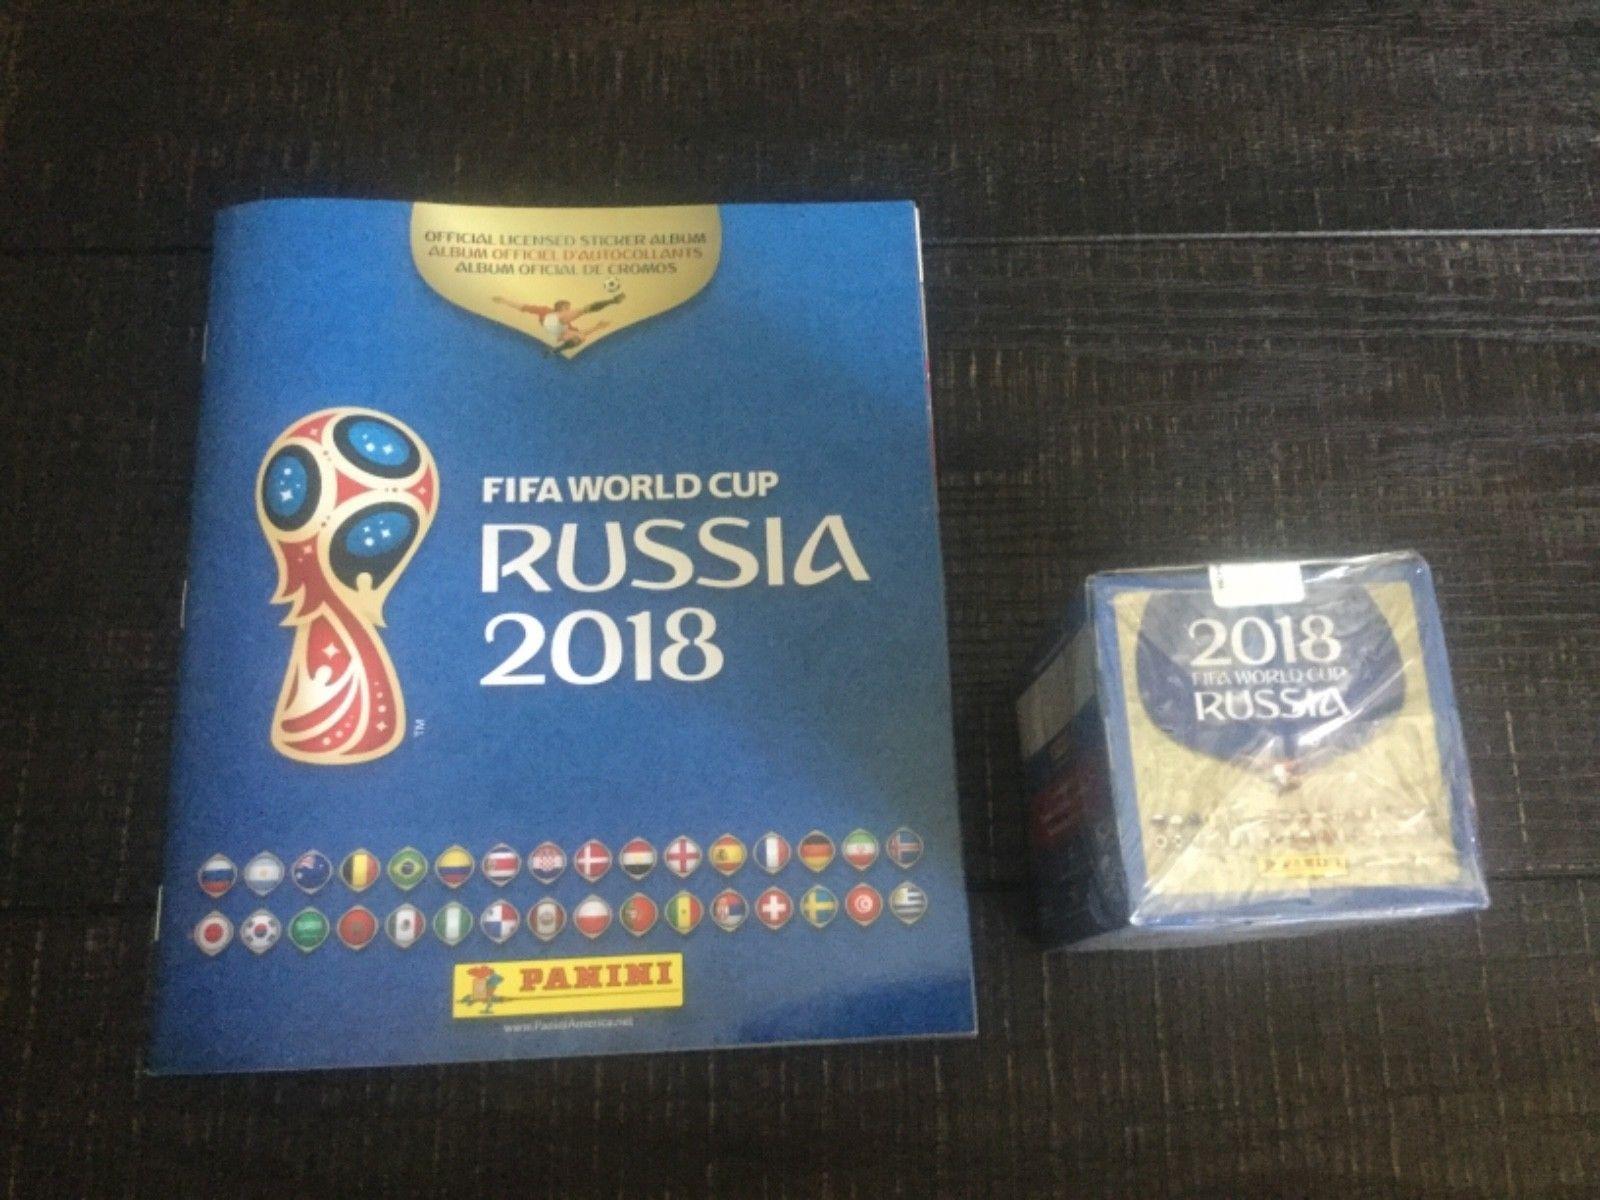 00d86e51b 2018 Panini Russia FIFA World Cup Soccer Sticker Bundle w/ 50 Pack Box  Discount Price